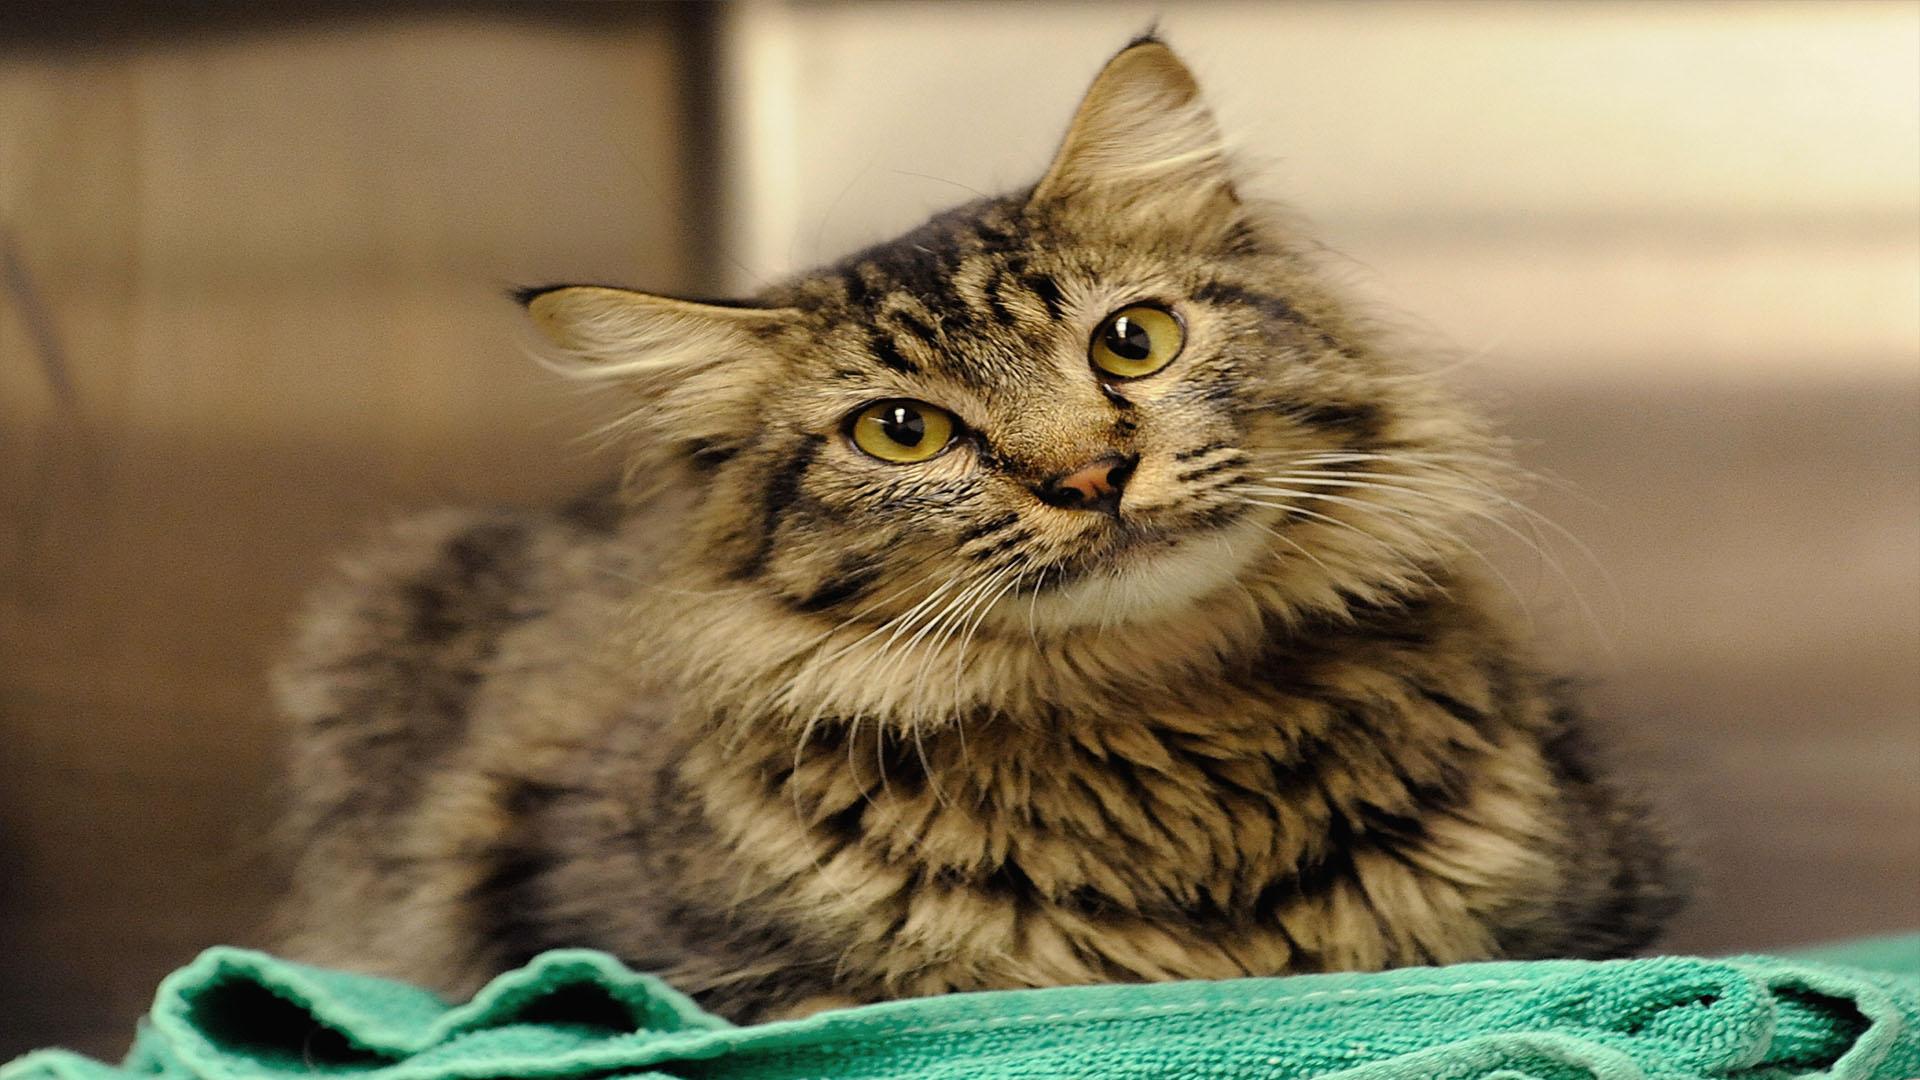 Cat generic_1557583688879.jpg-846652698.jpg